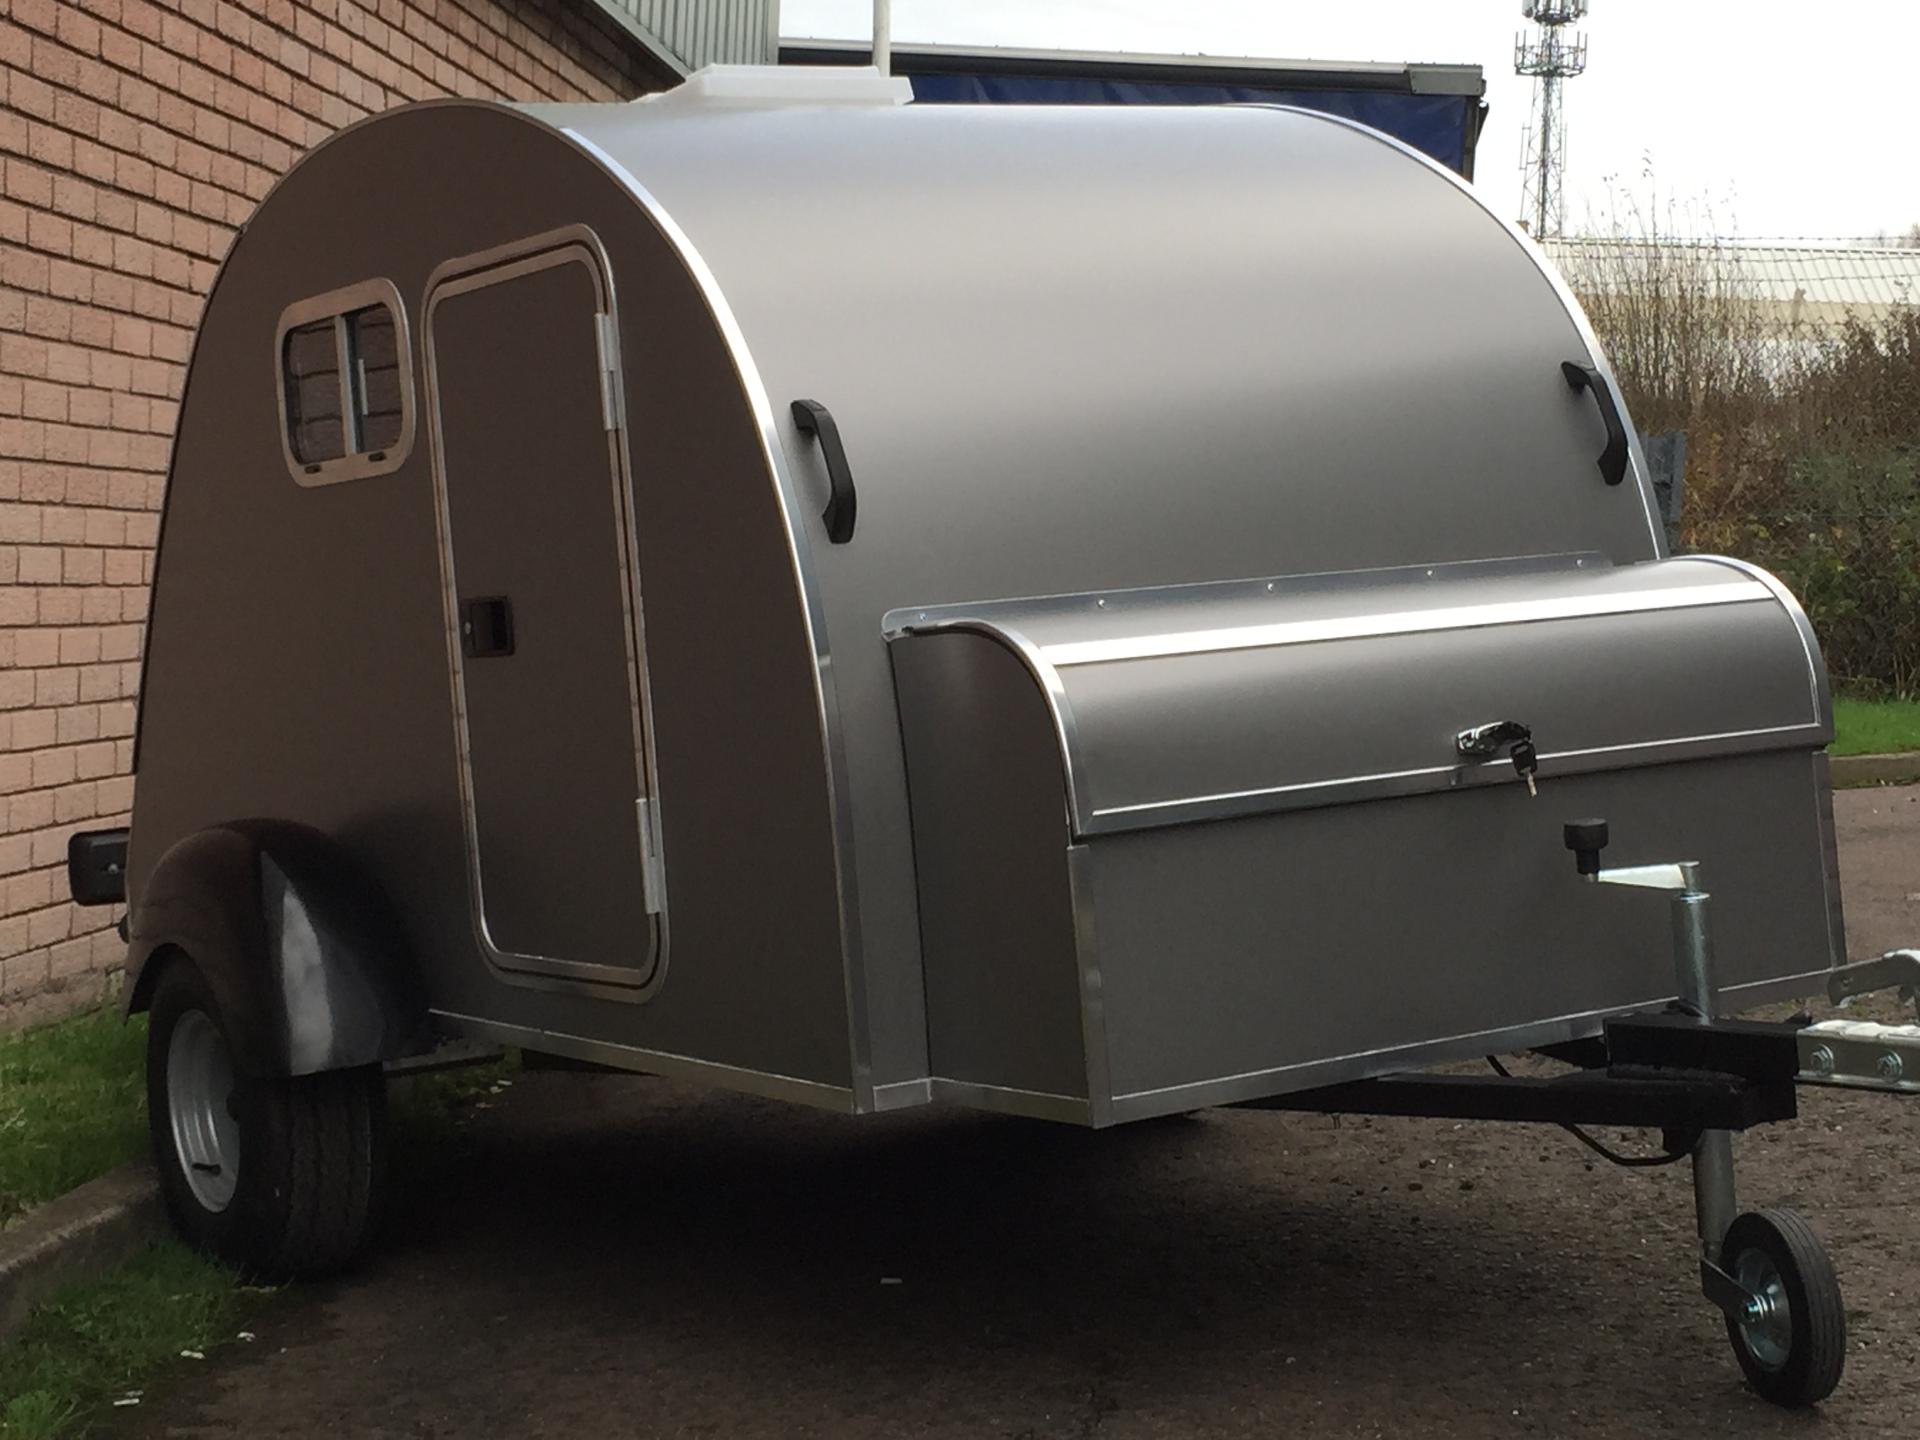 teardrop trailer, nodpod,carapod,cxamping,vw camper, transporter